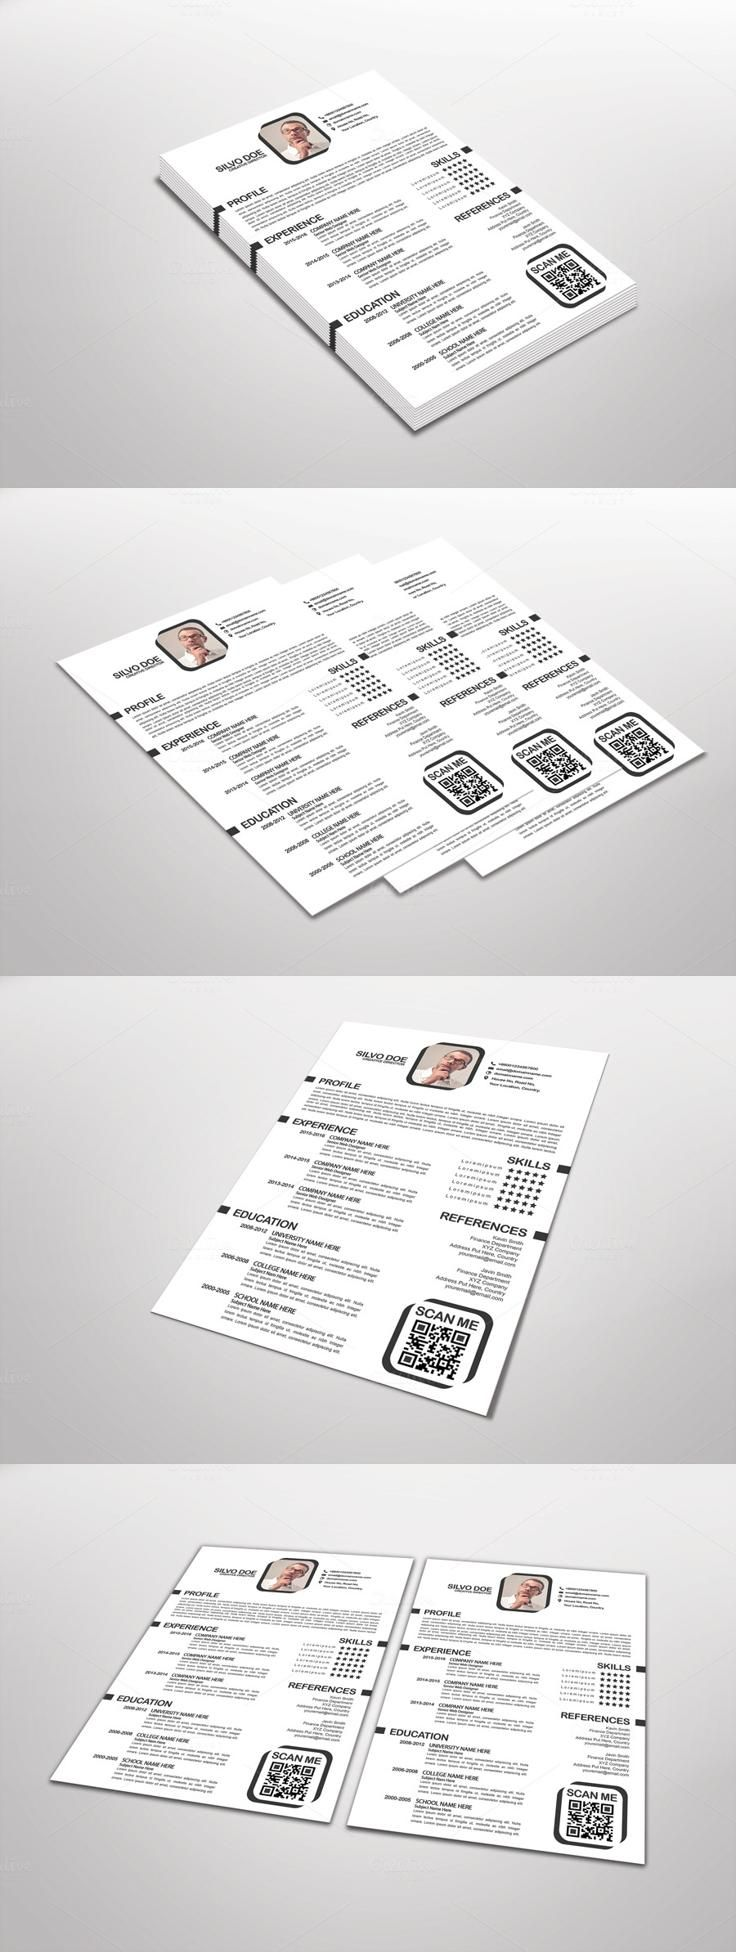 Pin de designspiration en Corporate Resumes & CVs | Pinterest